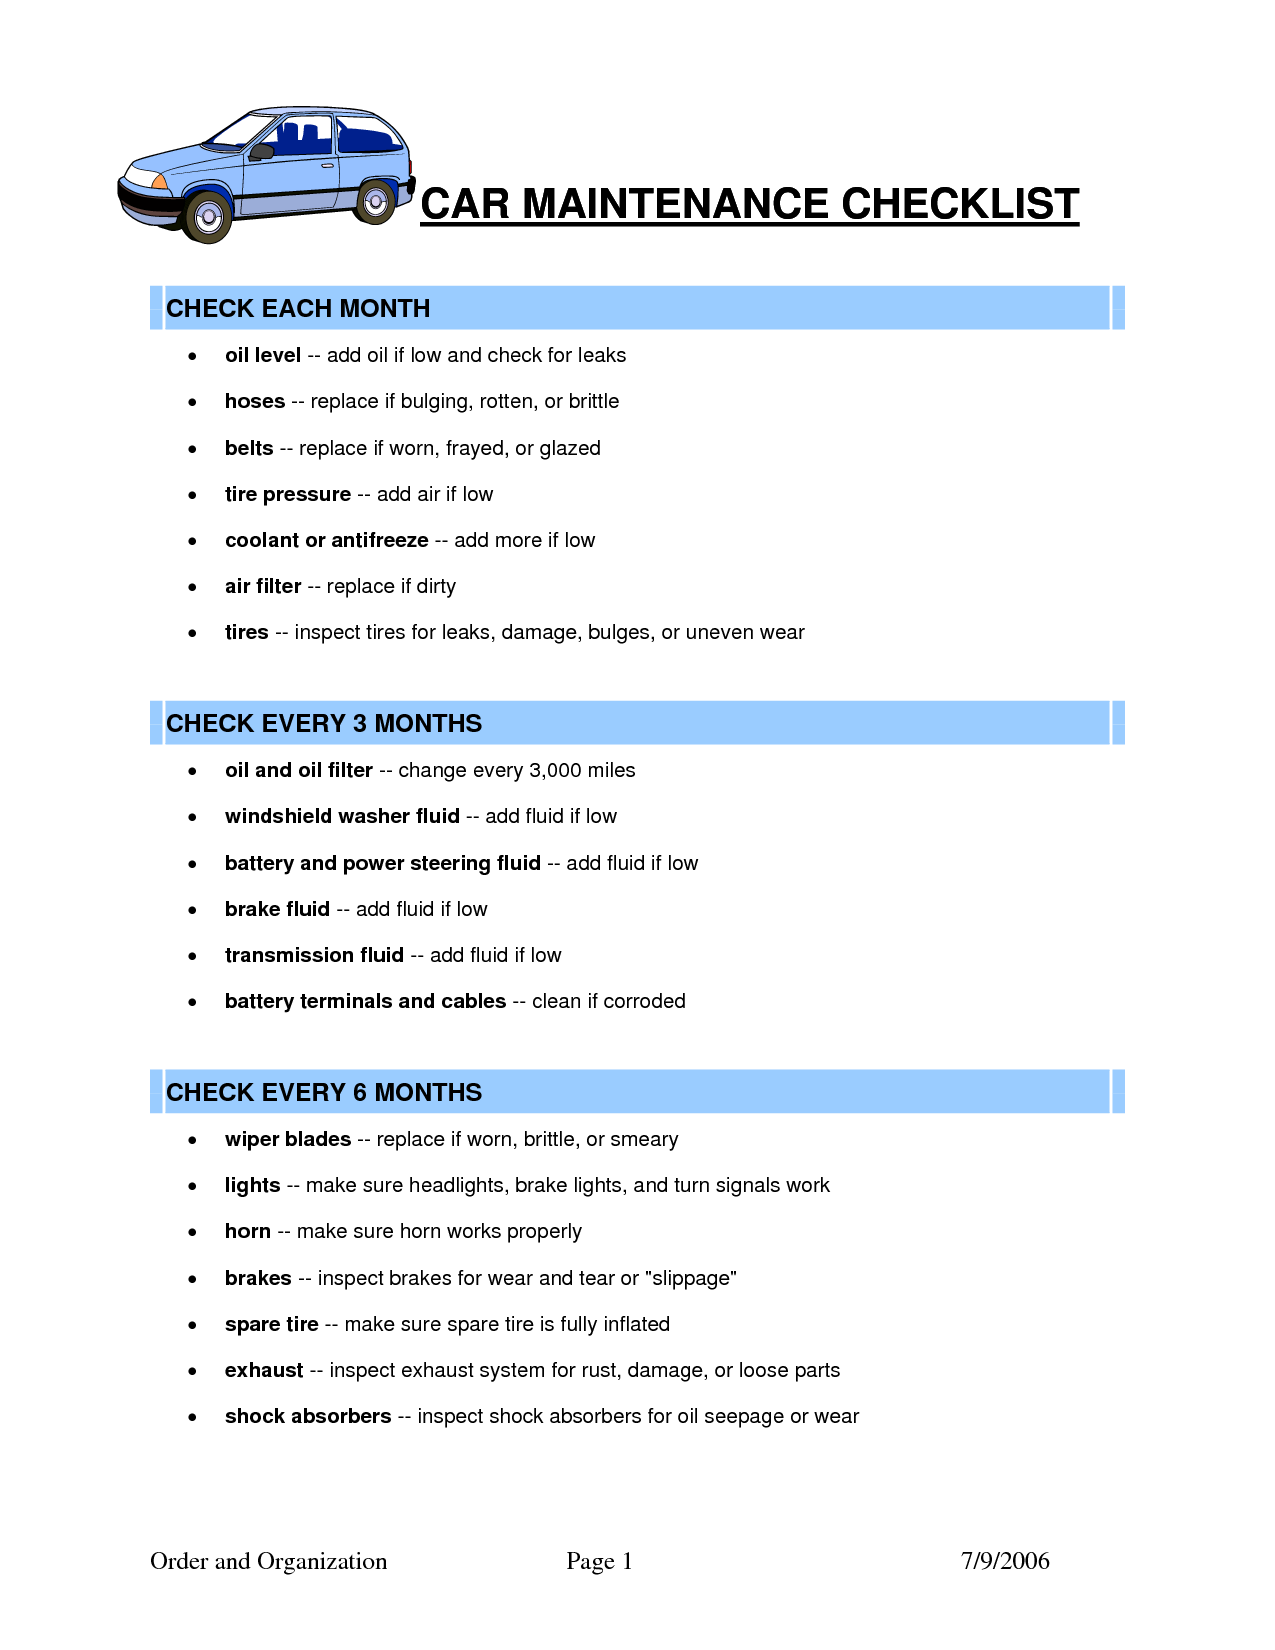 Vorlage Fur Die Checkliste Fur Die Fahrzeugwartung Checkliste Die Fahrzeugwartung Fur Car Maintenance Car Care Car Care Checklist